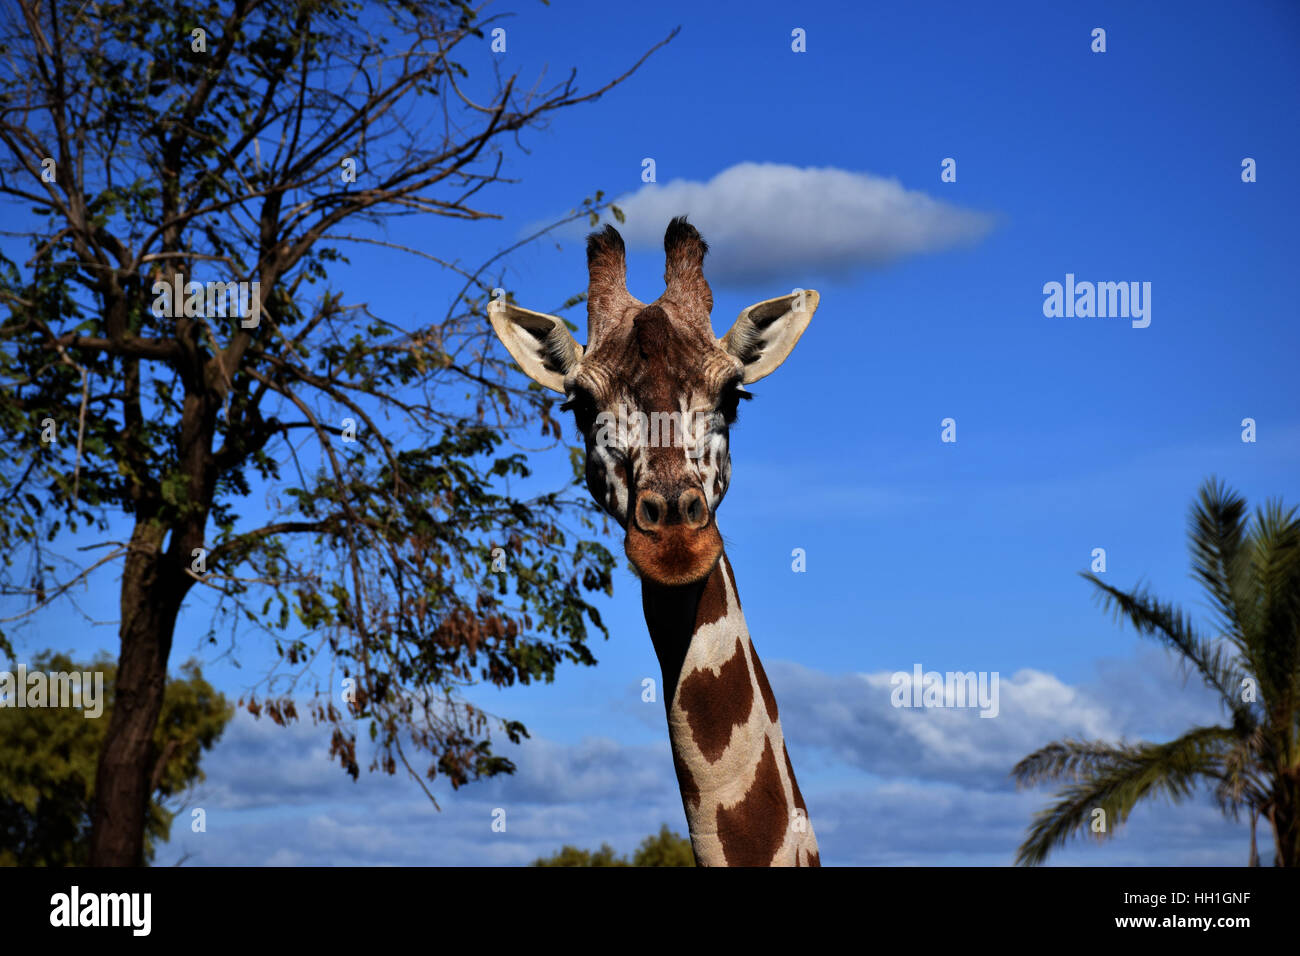 The giraffe in your habitat - Stock Image